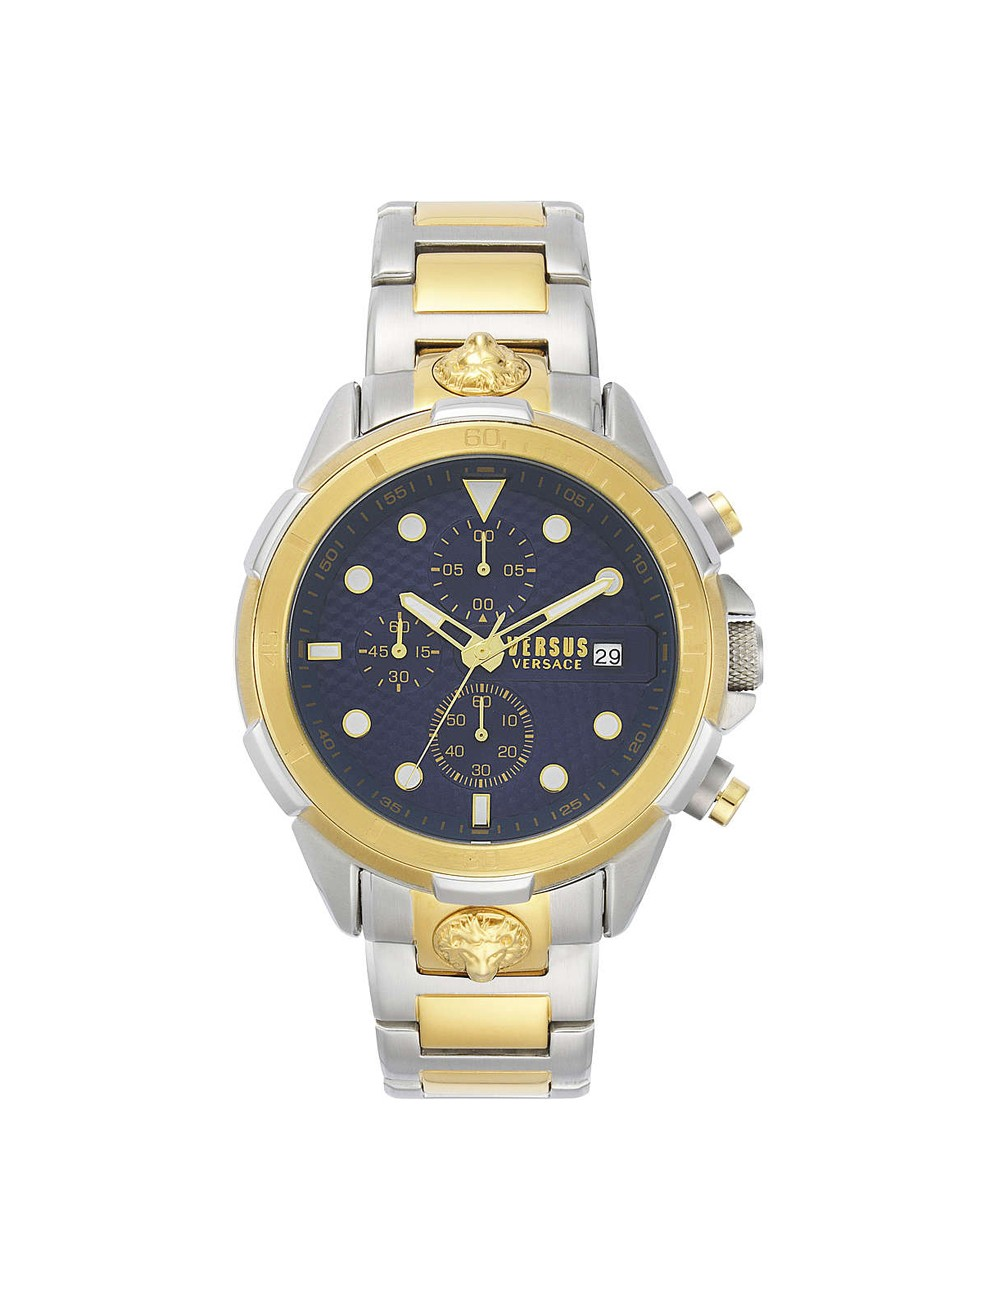 Versus VSPLP0519 6E Arrondissement Mens Watch Chronograph